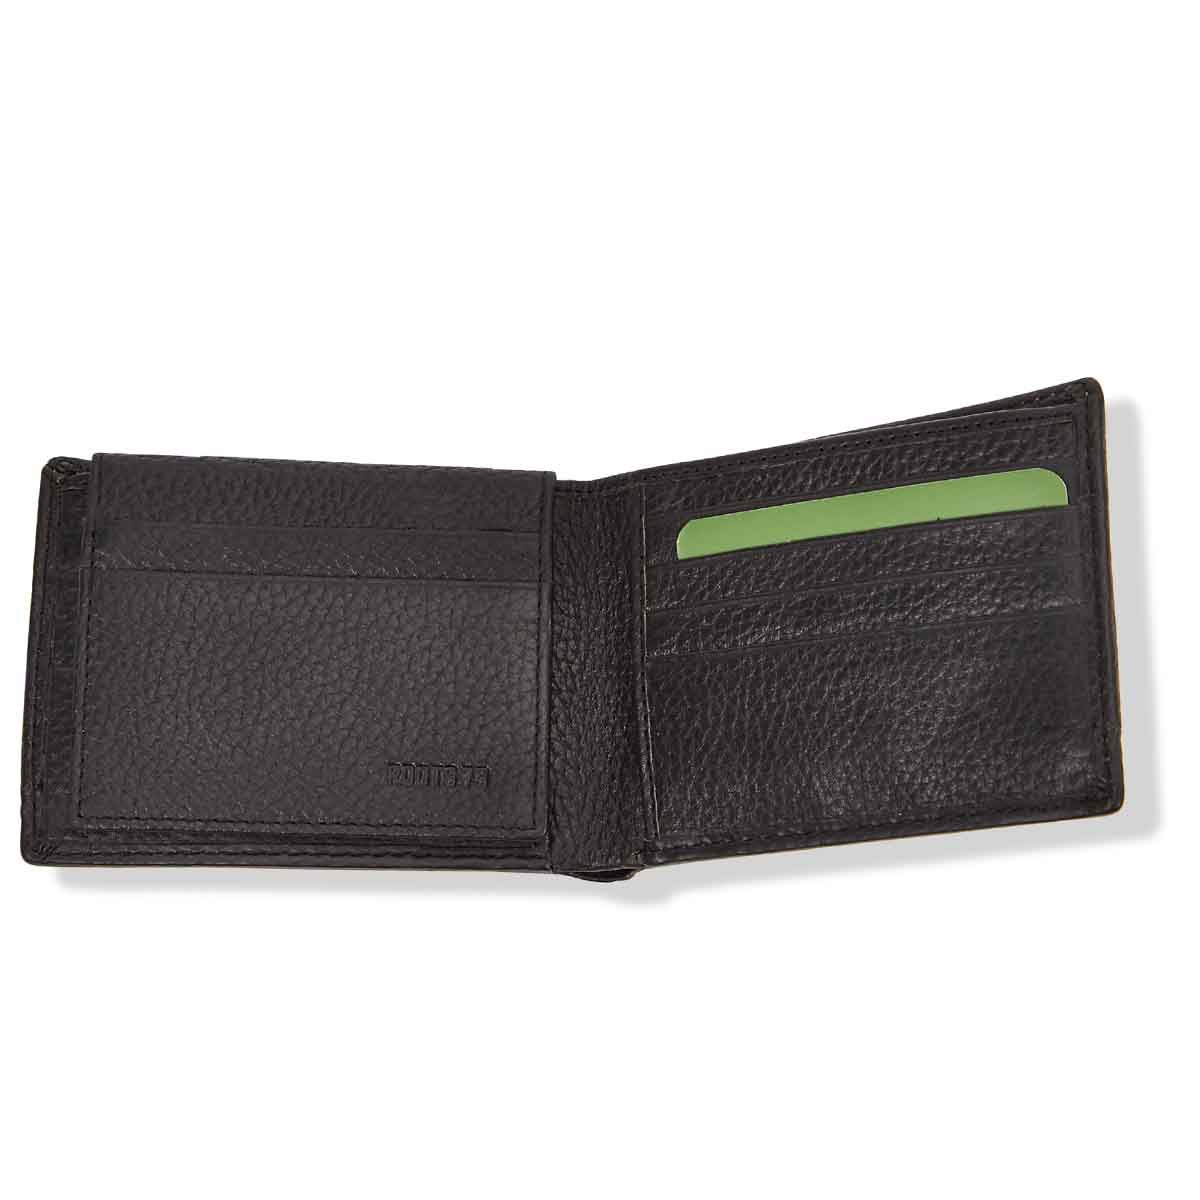 Mns Marine blk combo slimfold wallet